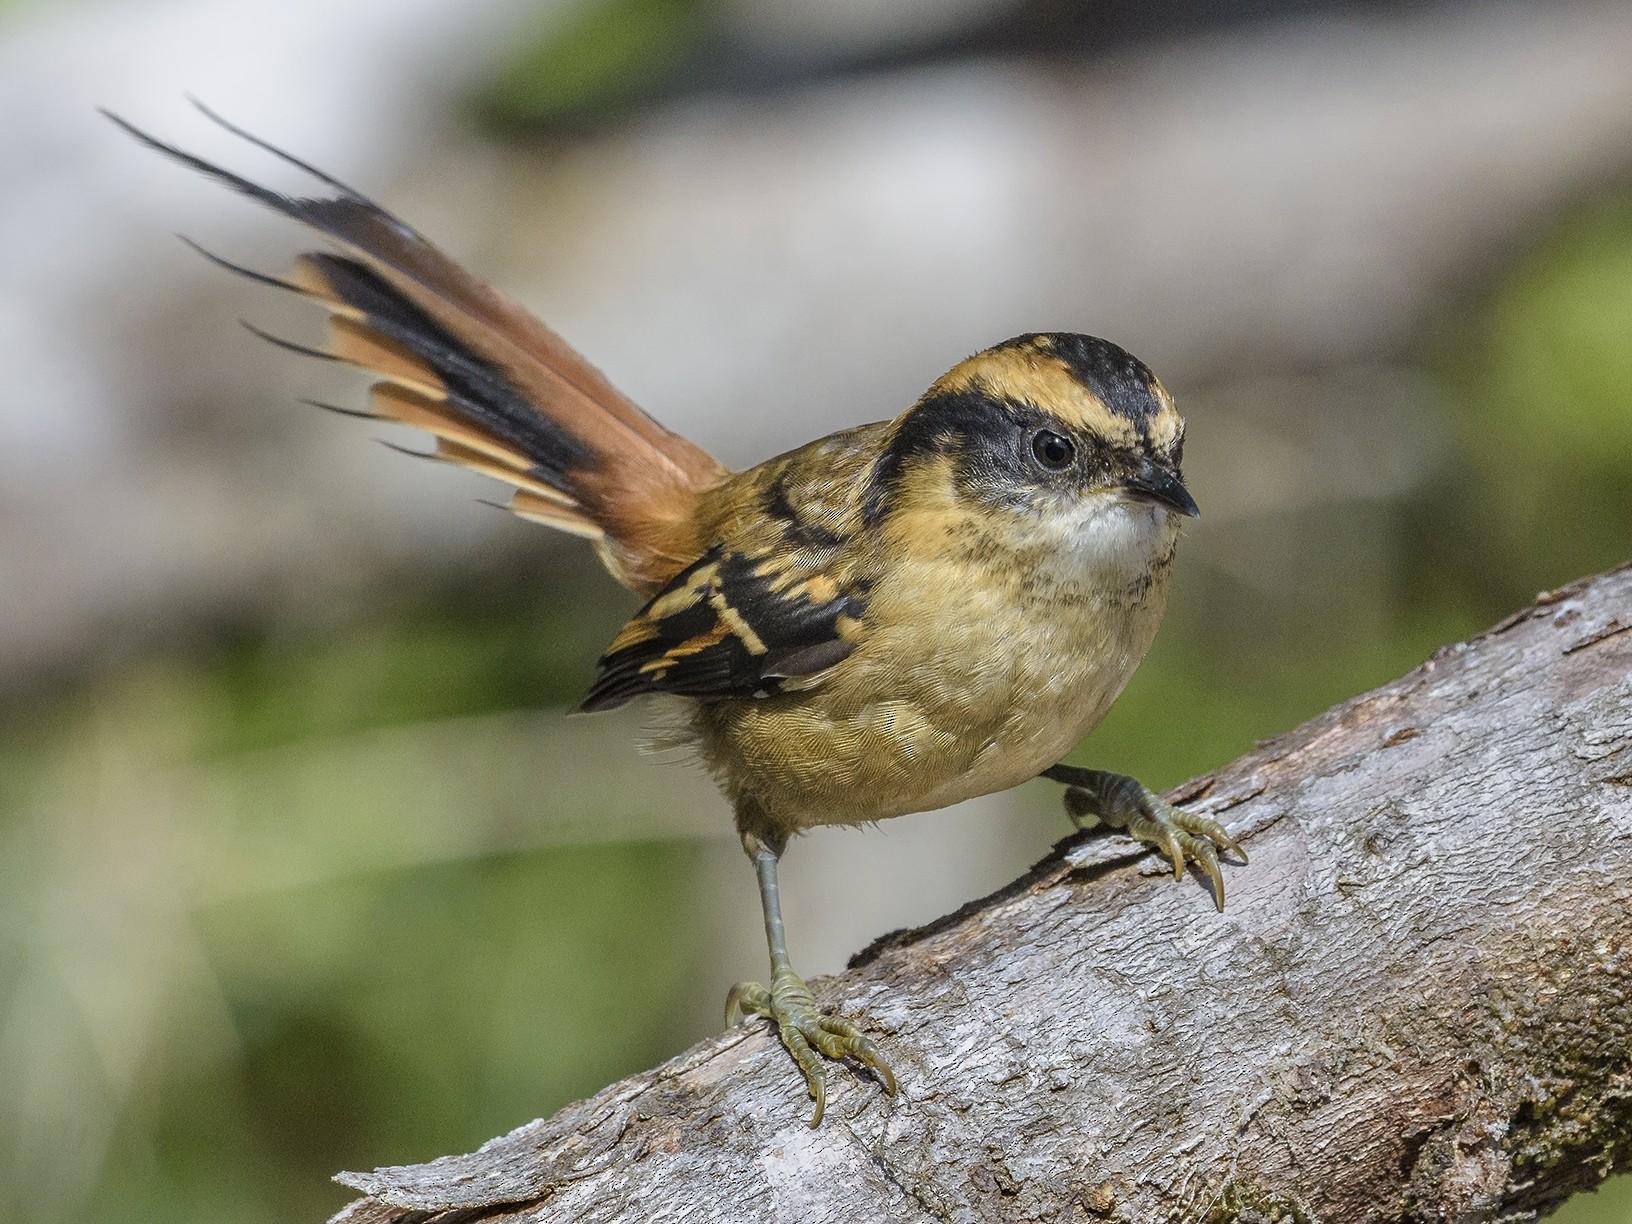 Thorn-tailed Rayadito - VERONICA ARAYA GARCIA